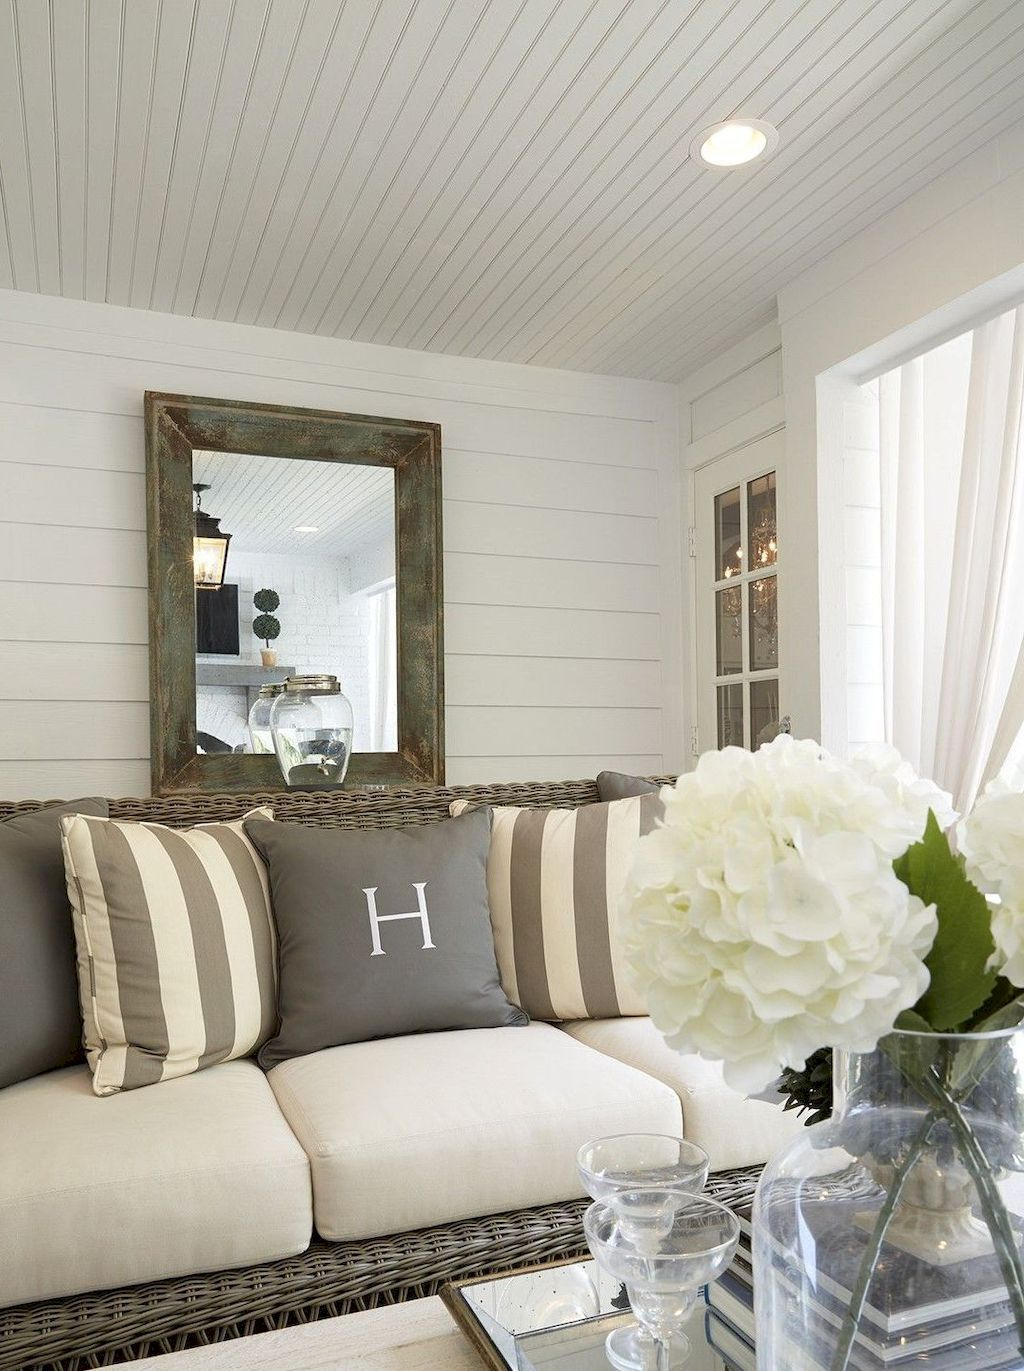 Window ideas for a sunroom   cozy modern farmhouse sunroom decor ideas  cosas de casa